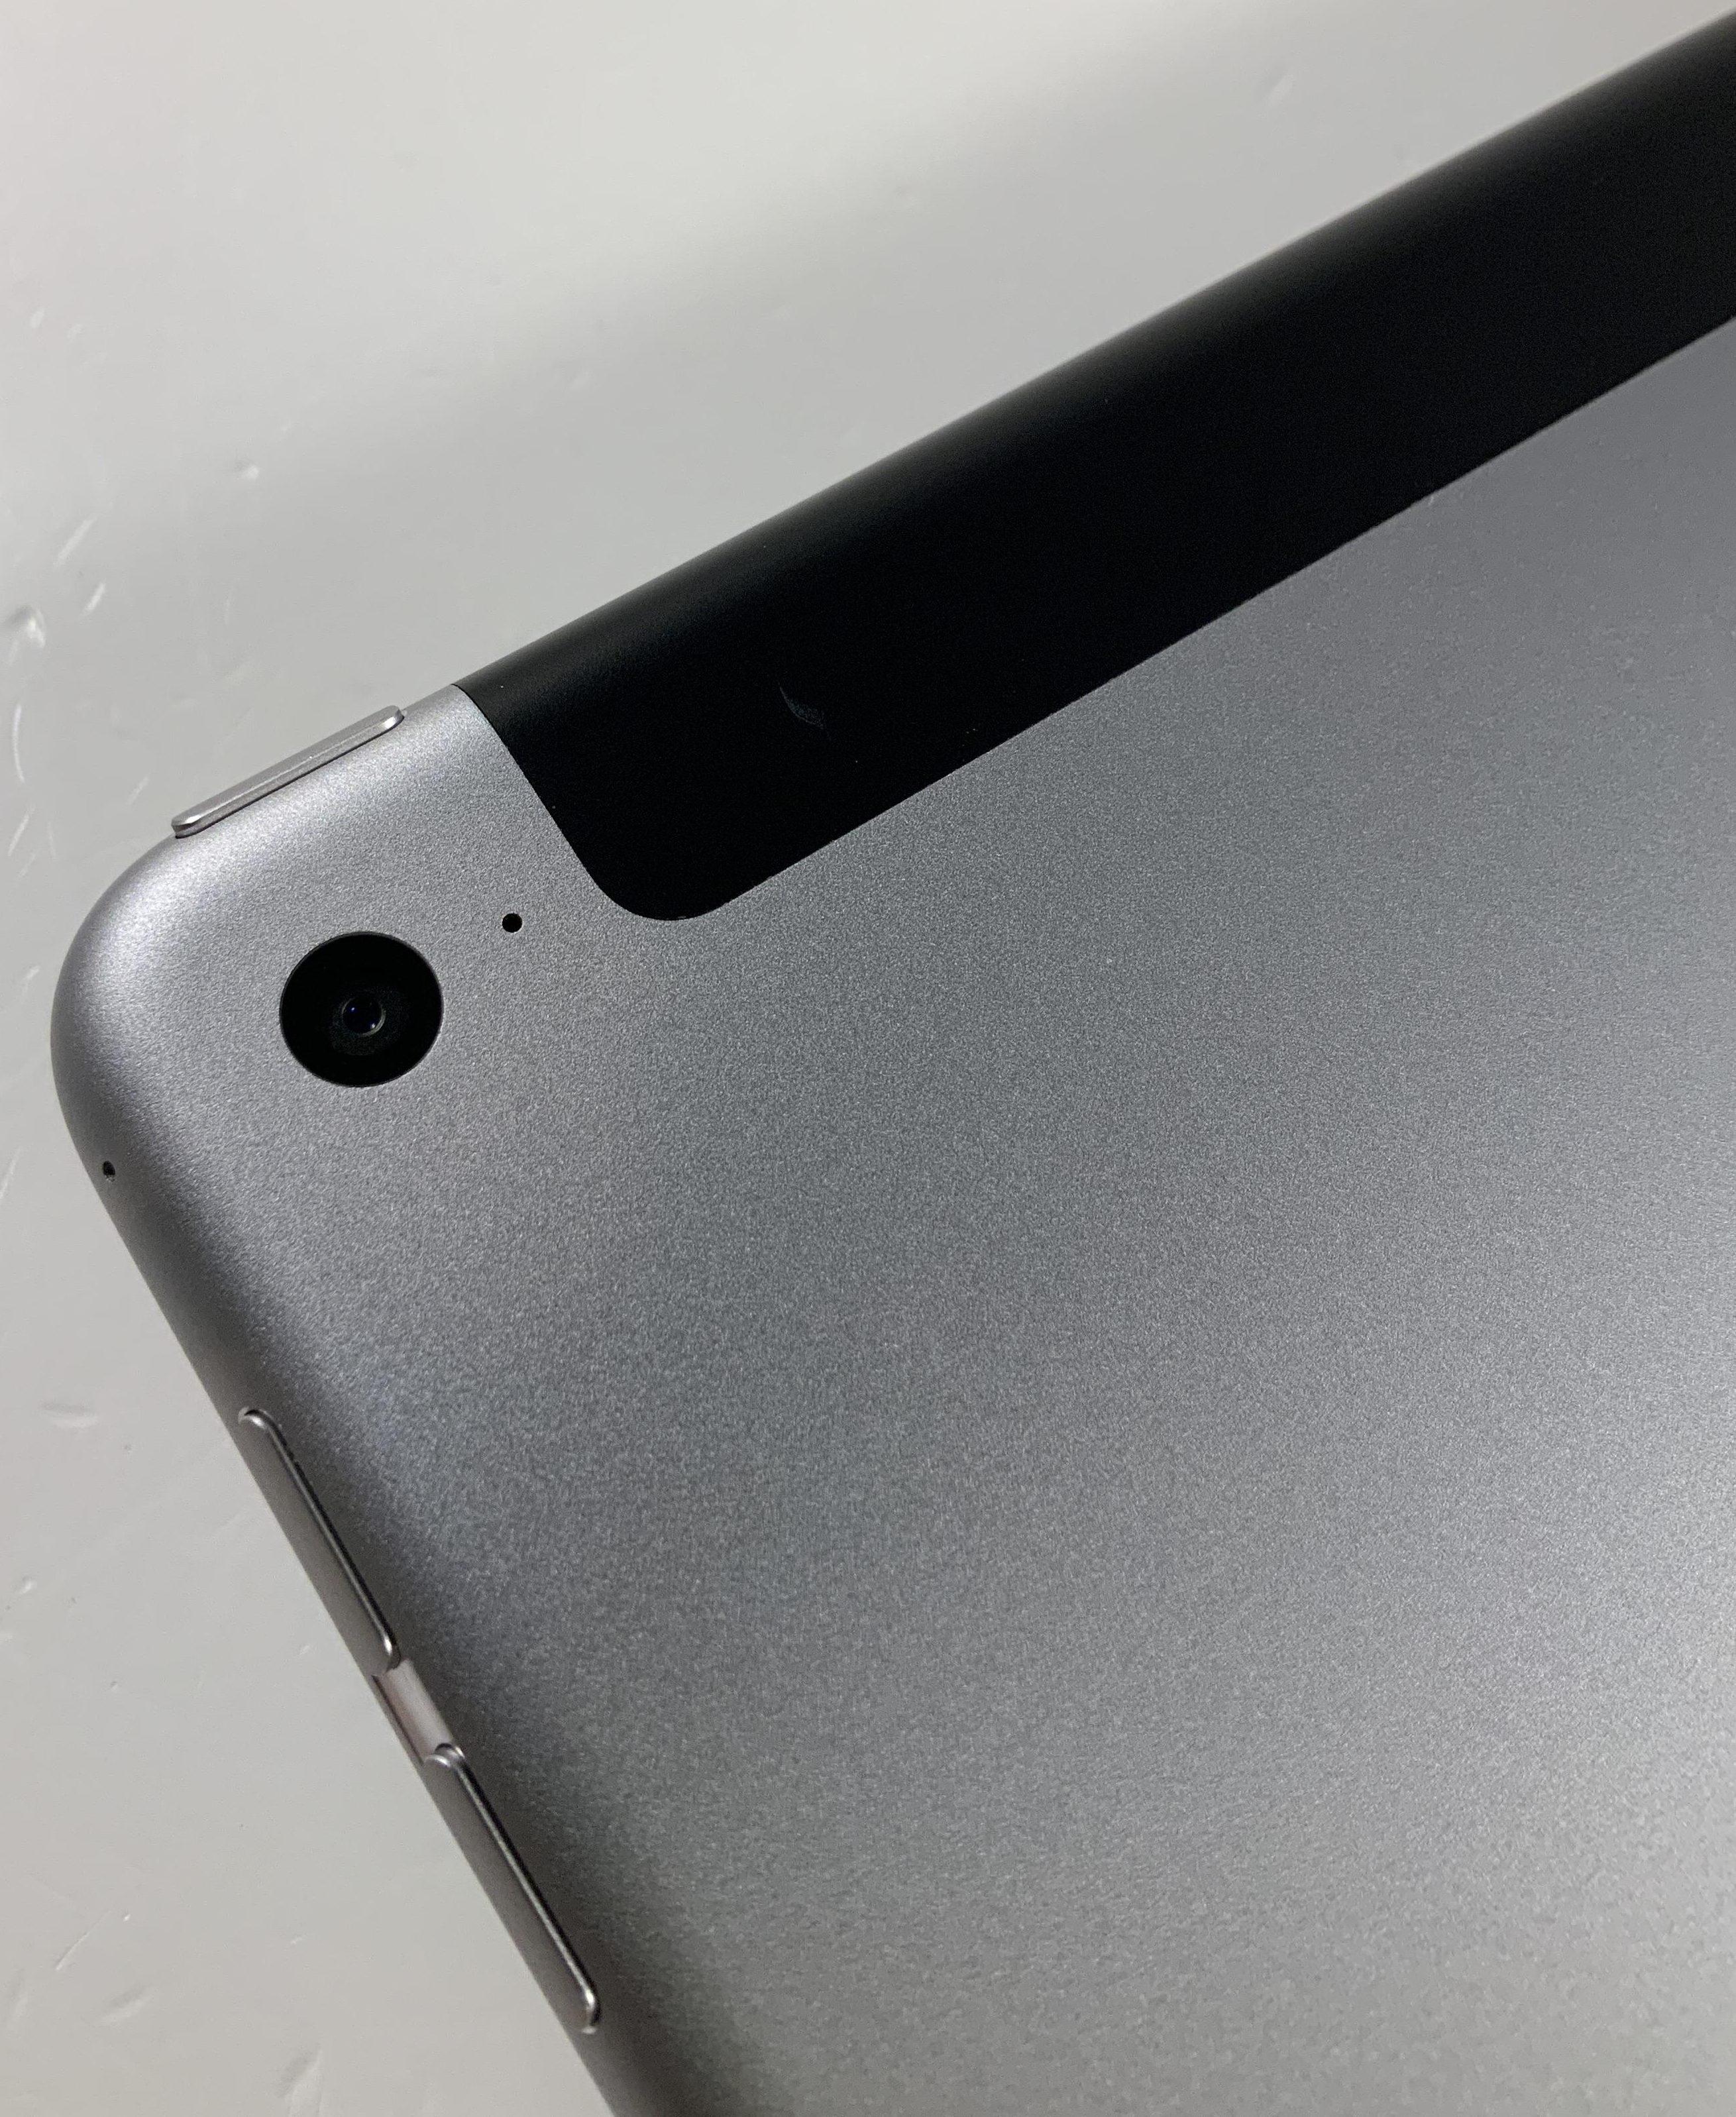 iPad Air 2 Wi-Fi + Cellular 64GB, 64GB, Space Gray, image 4